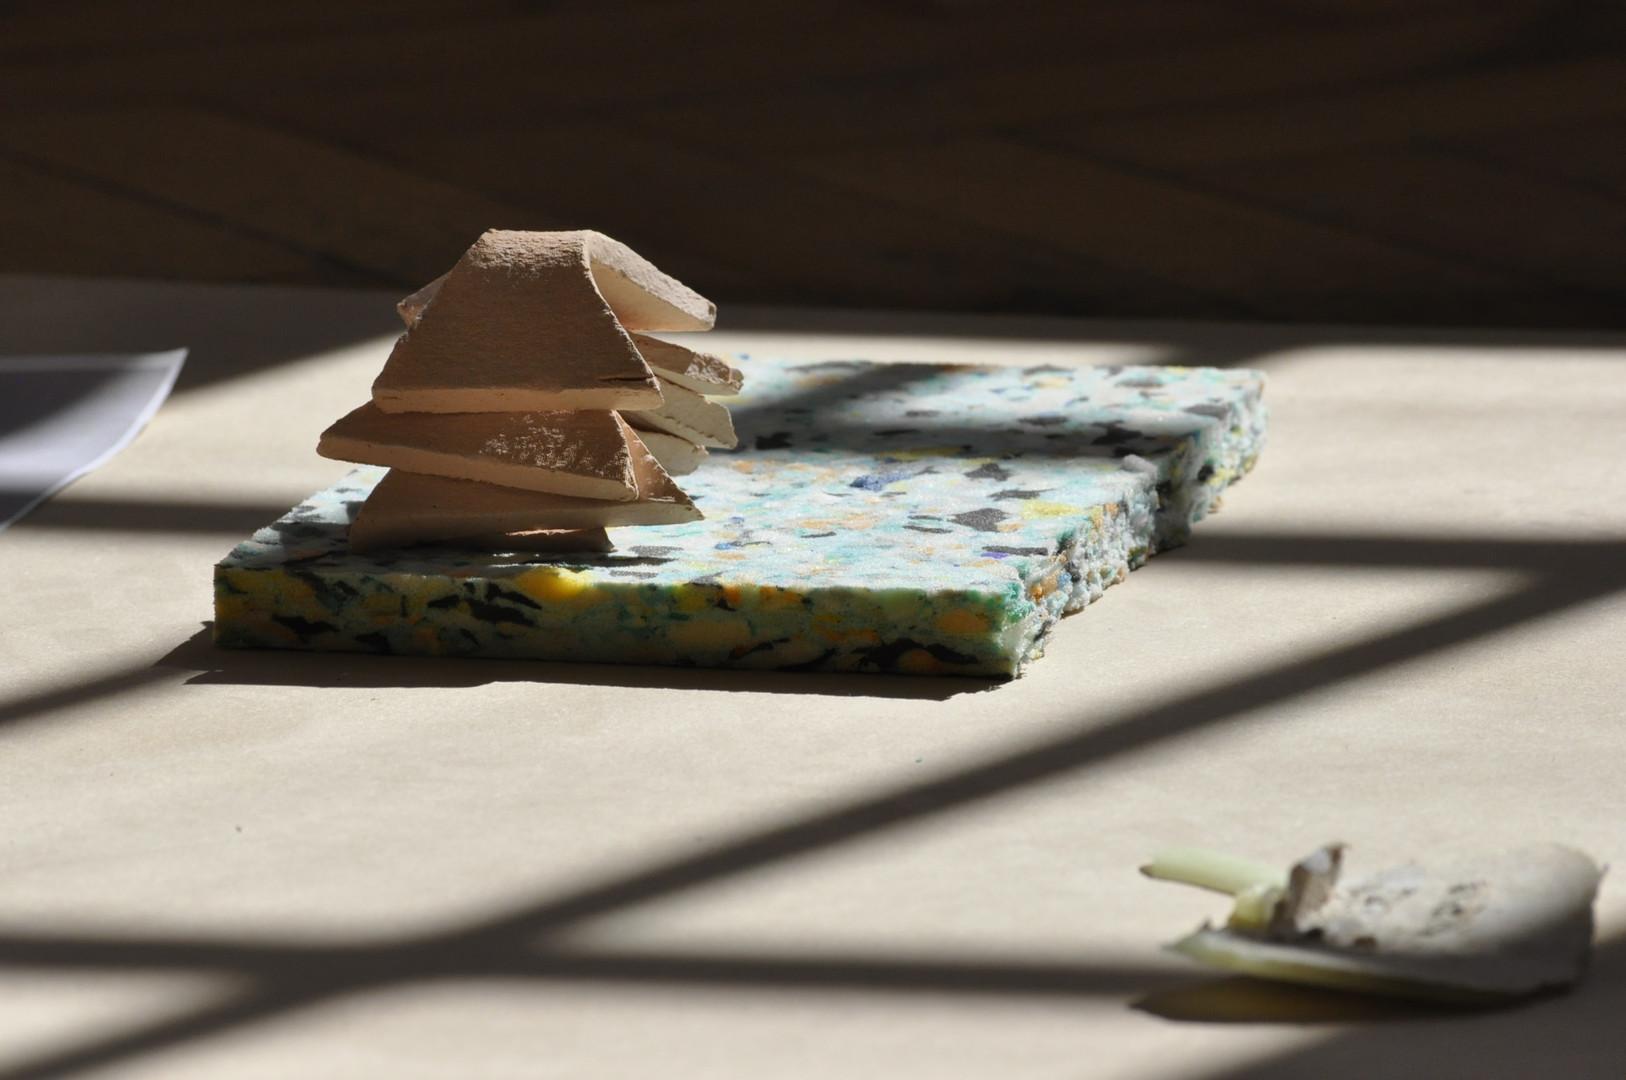 Ceramic, recycled foam, wax, cardboard, paper on MDF